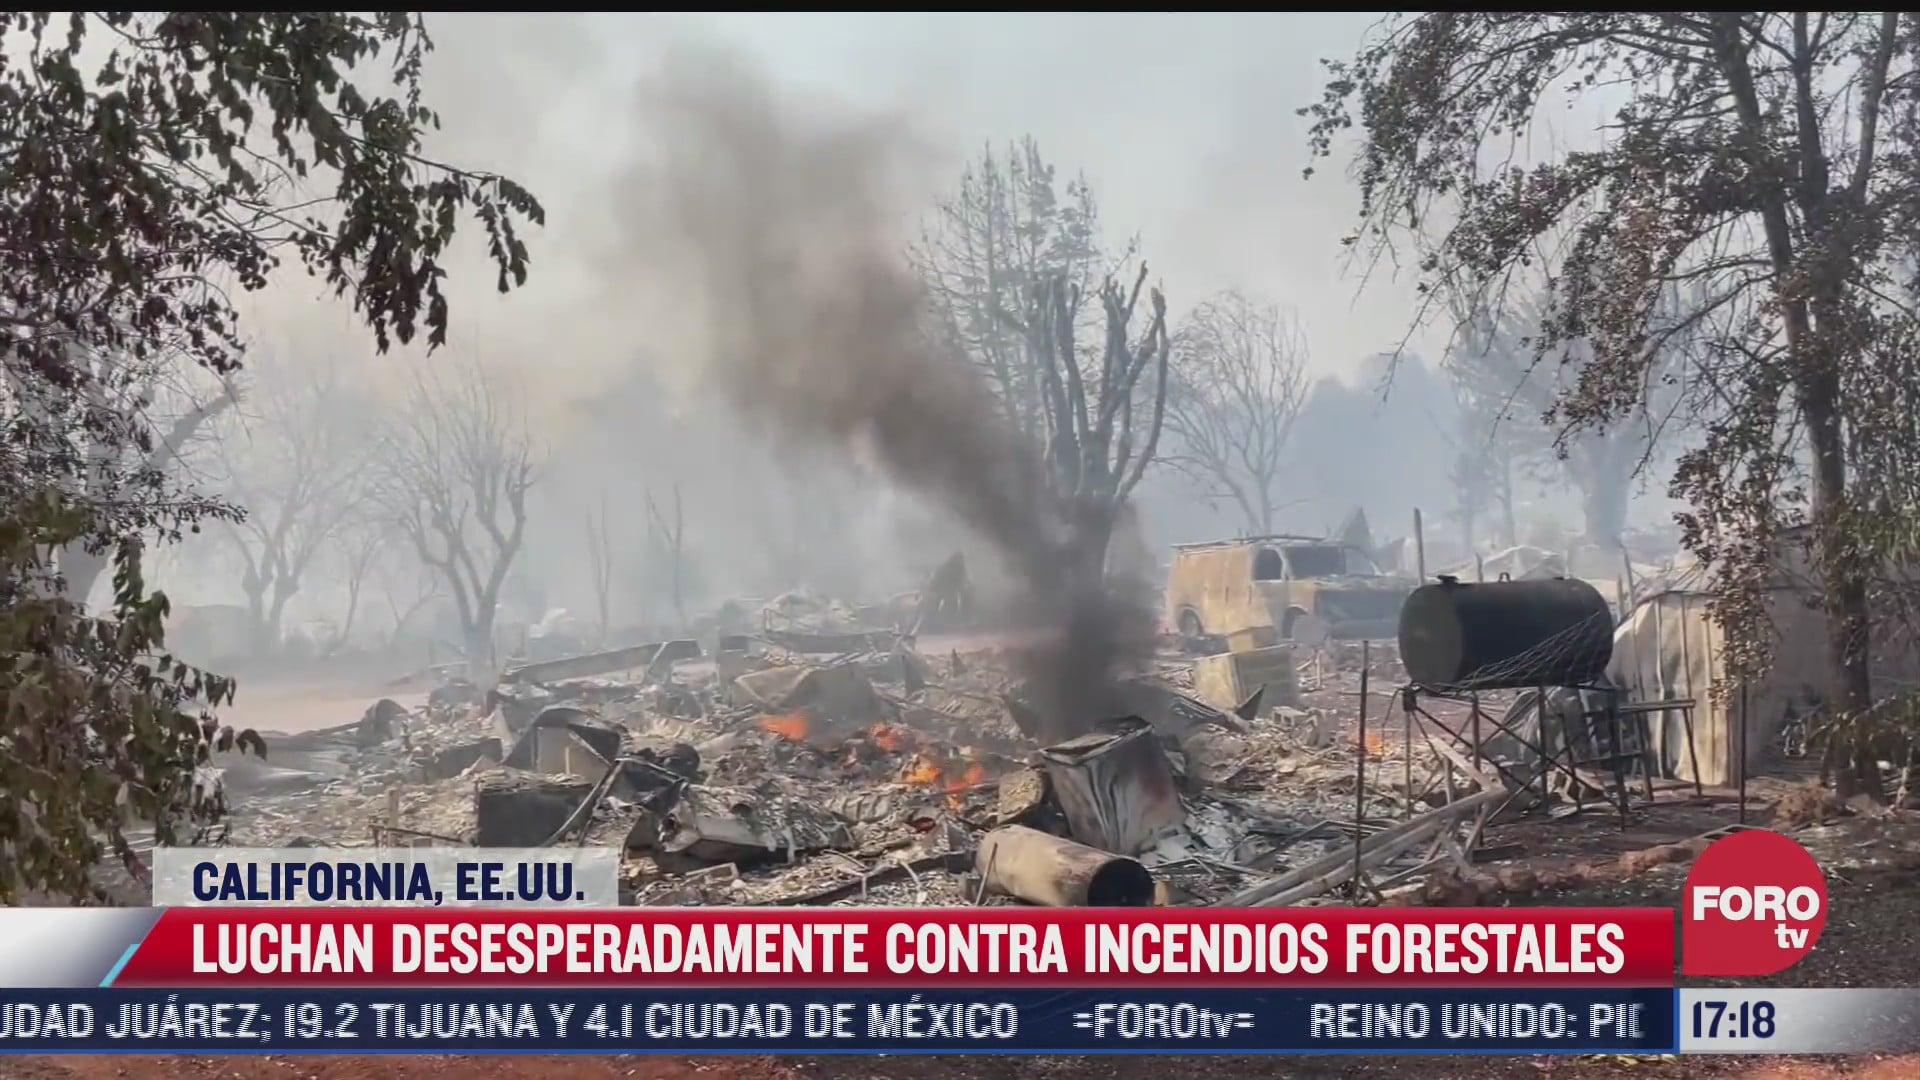 bomberos luchan contra incendios forestales en california